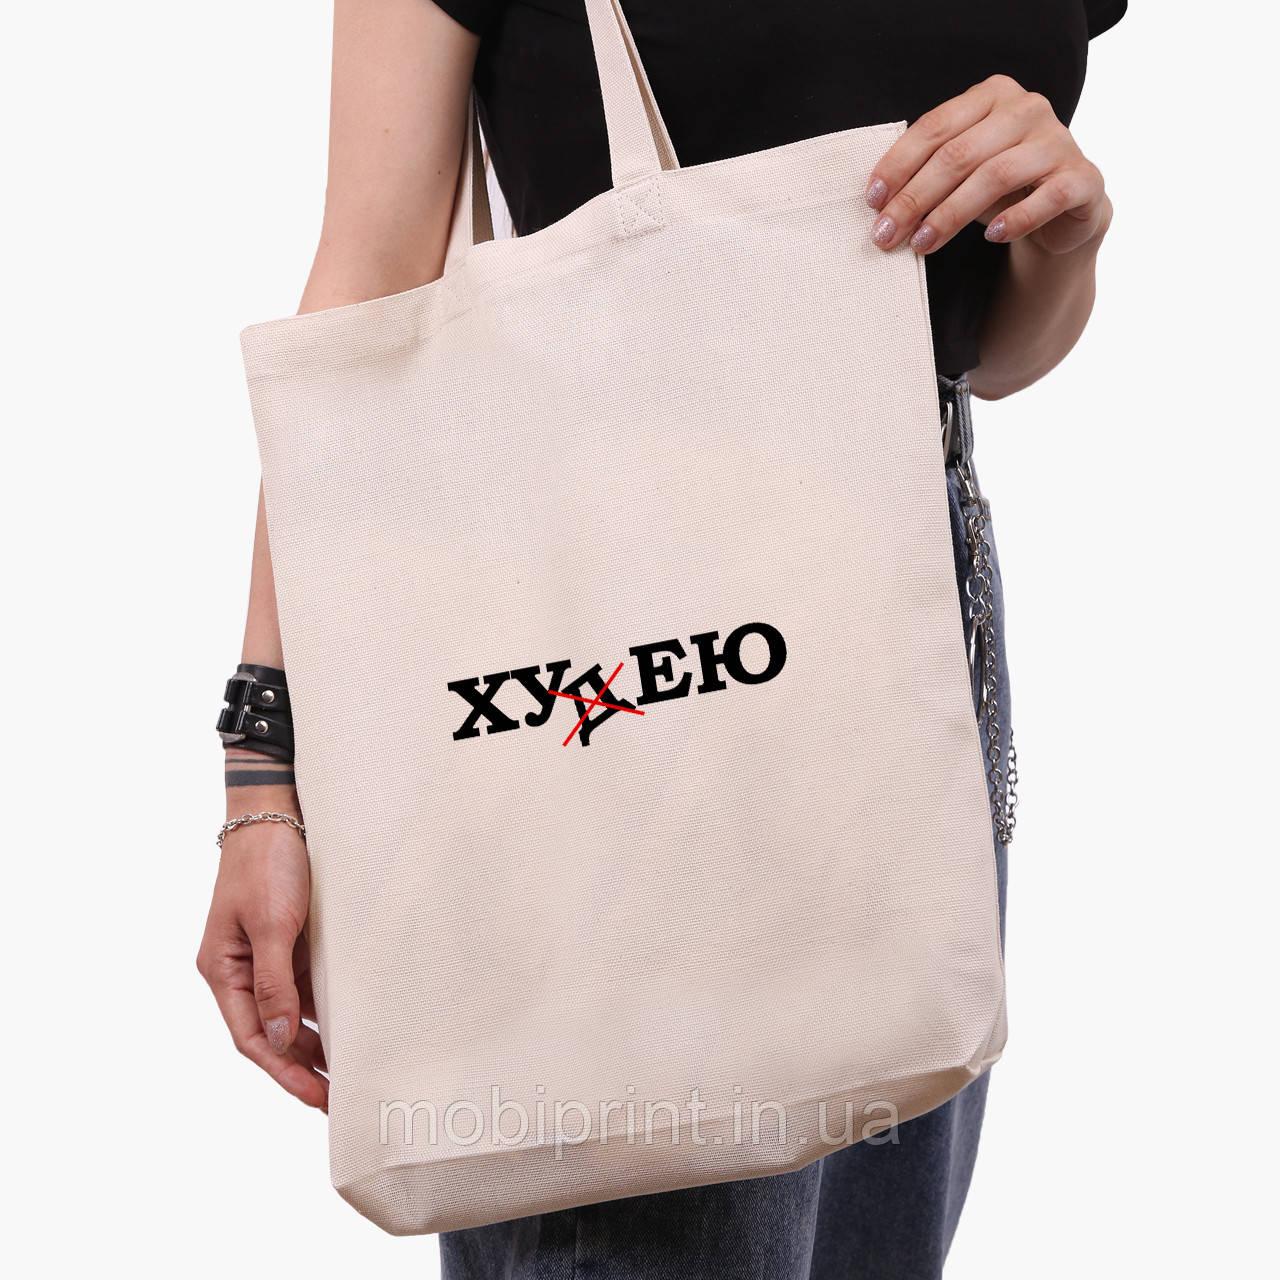 Еко сумка шоппер біла Худну (Lose weight) (9227-1286-1) 41*39*8 см